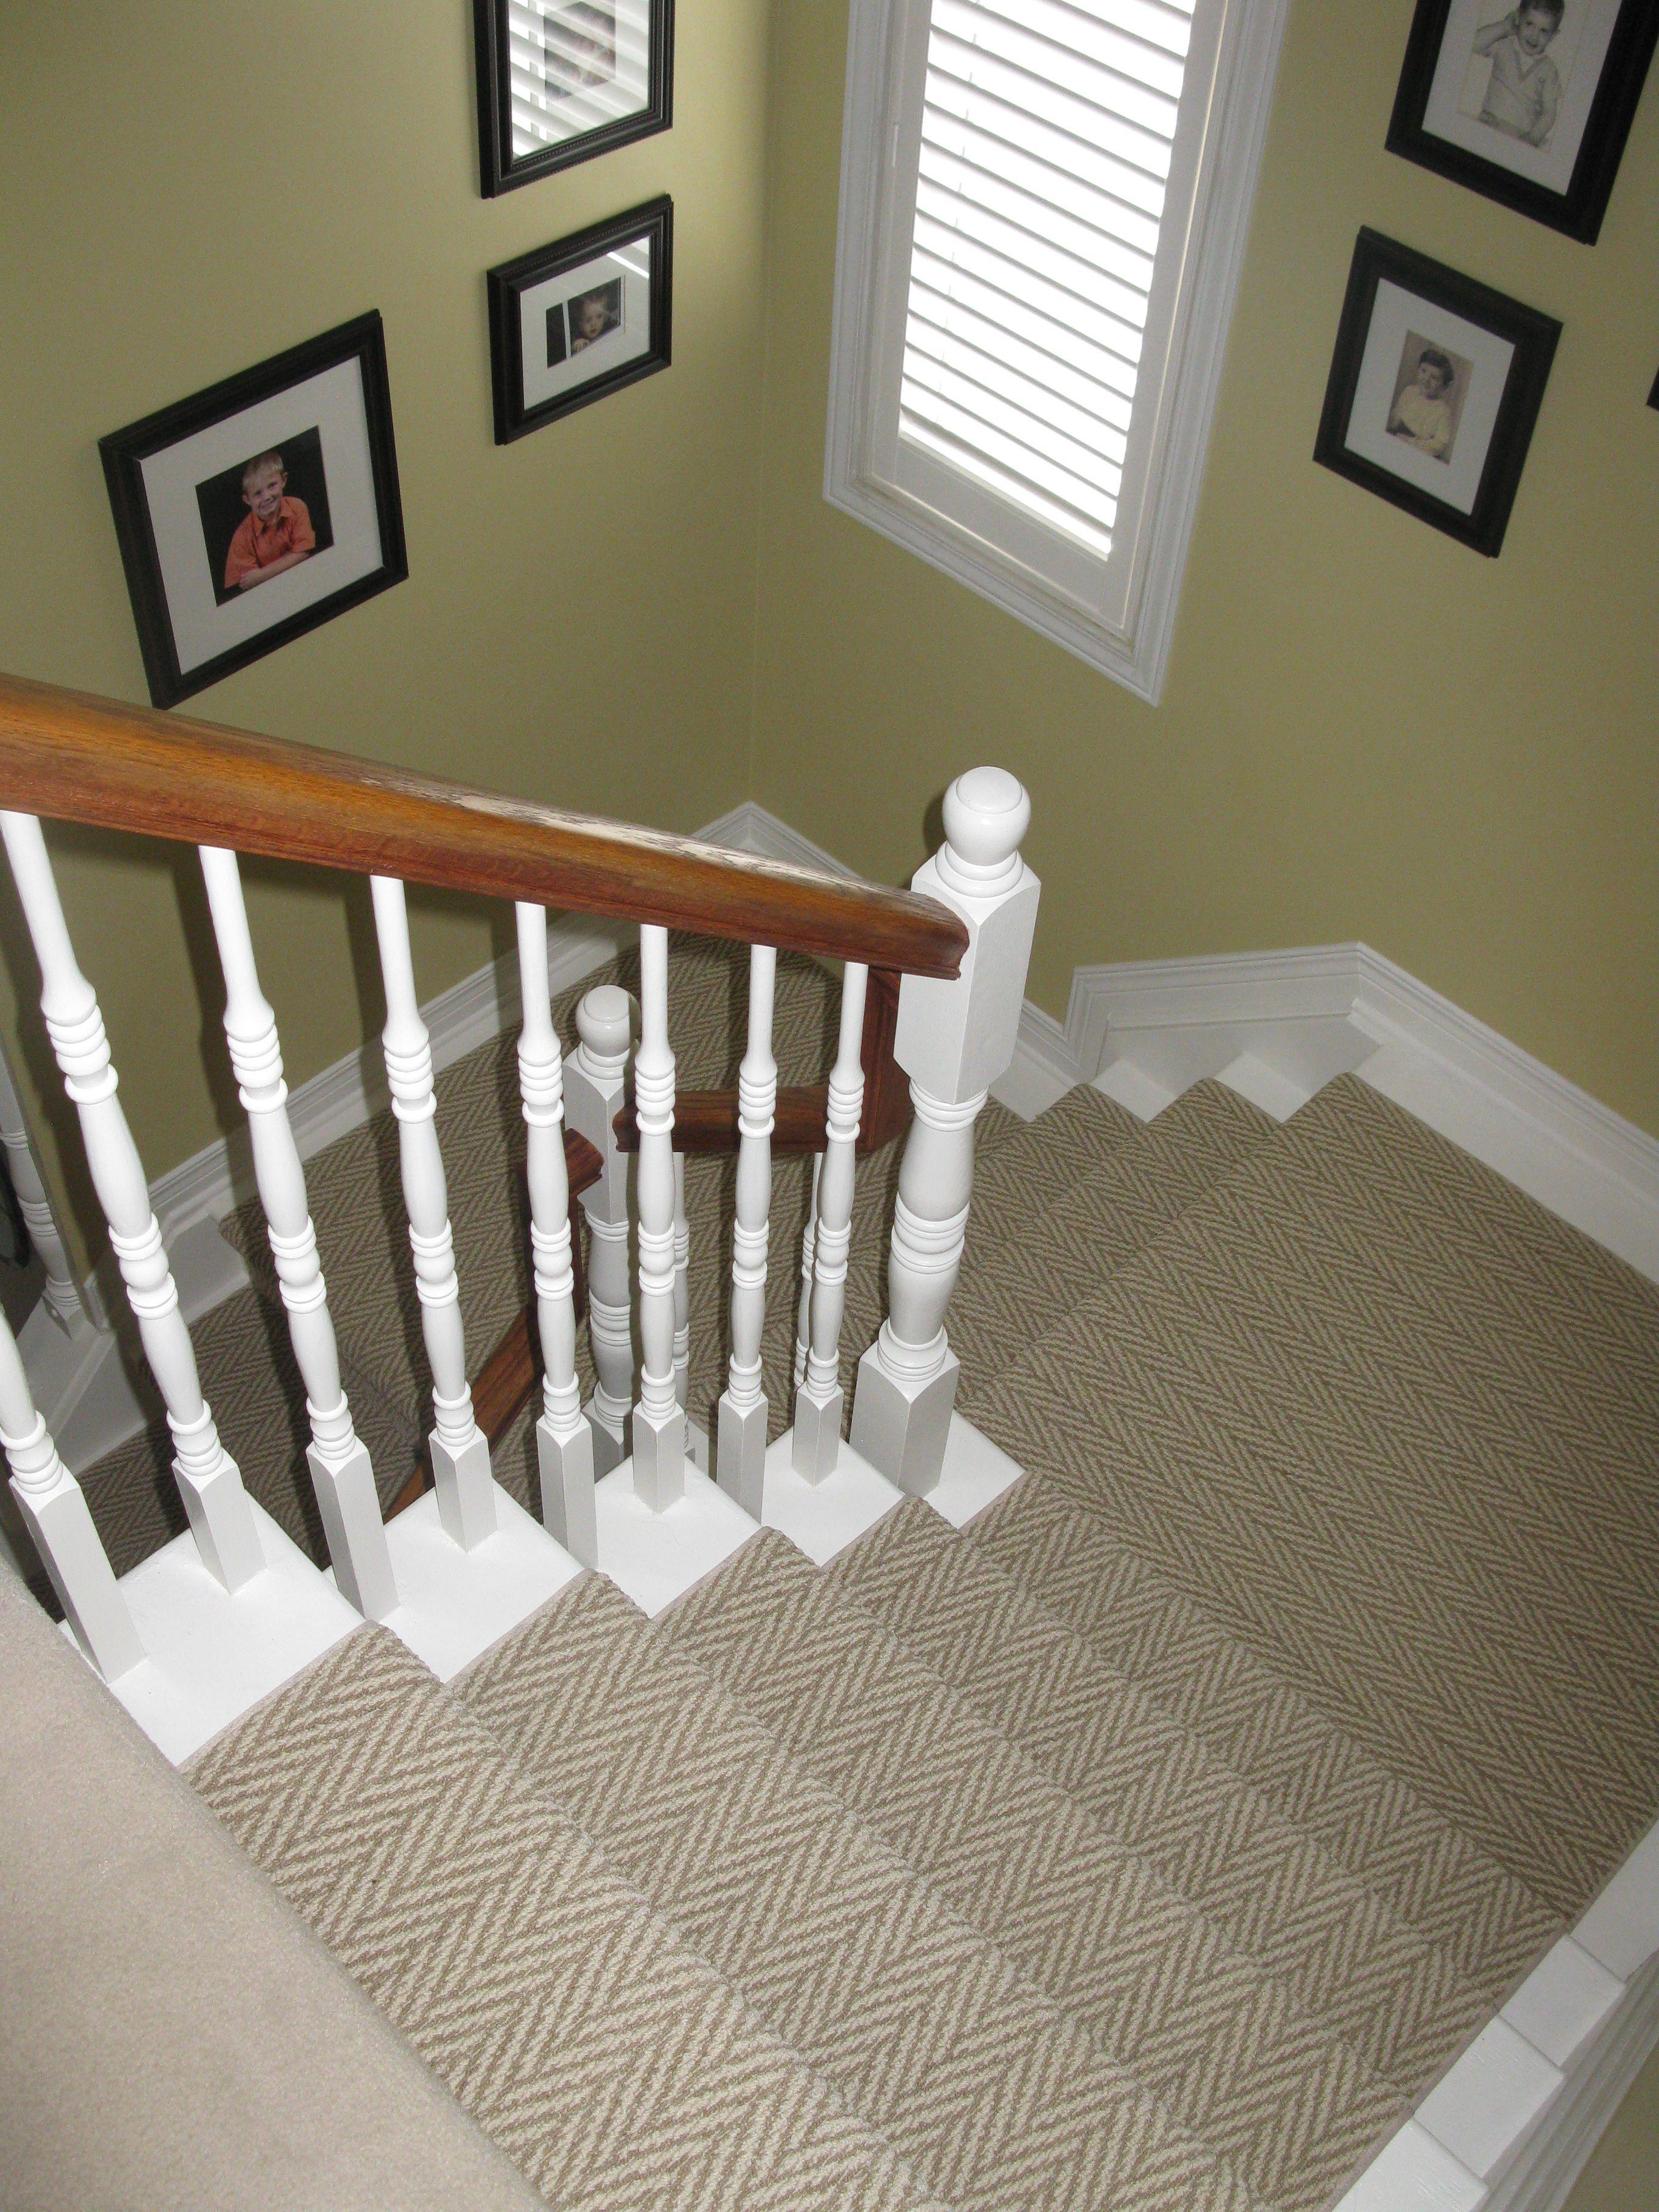 Best Tuftex Only Natural In Fine Grain Stair Runner Hall Decor 400 x 300